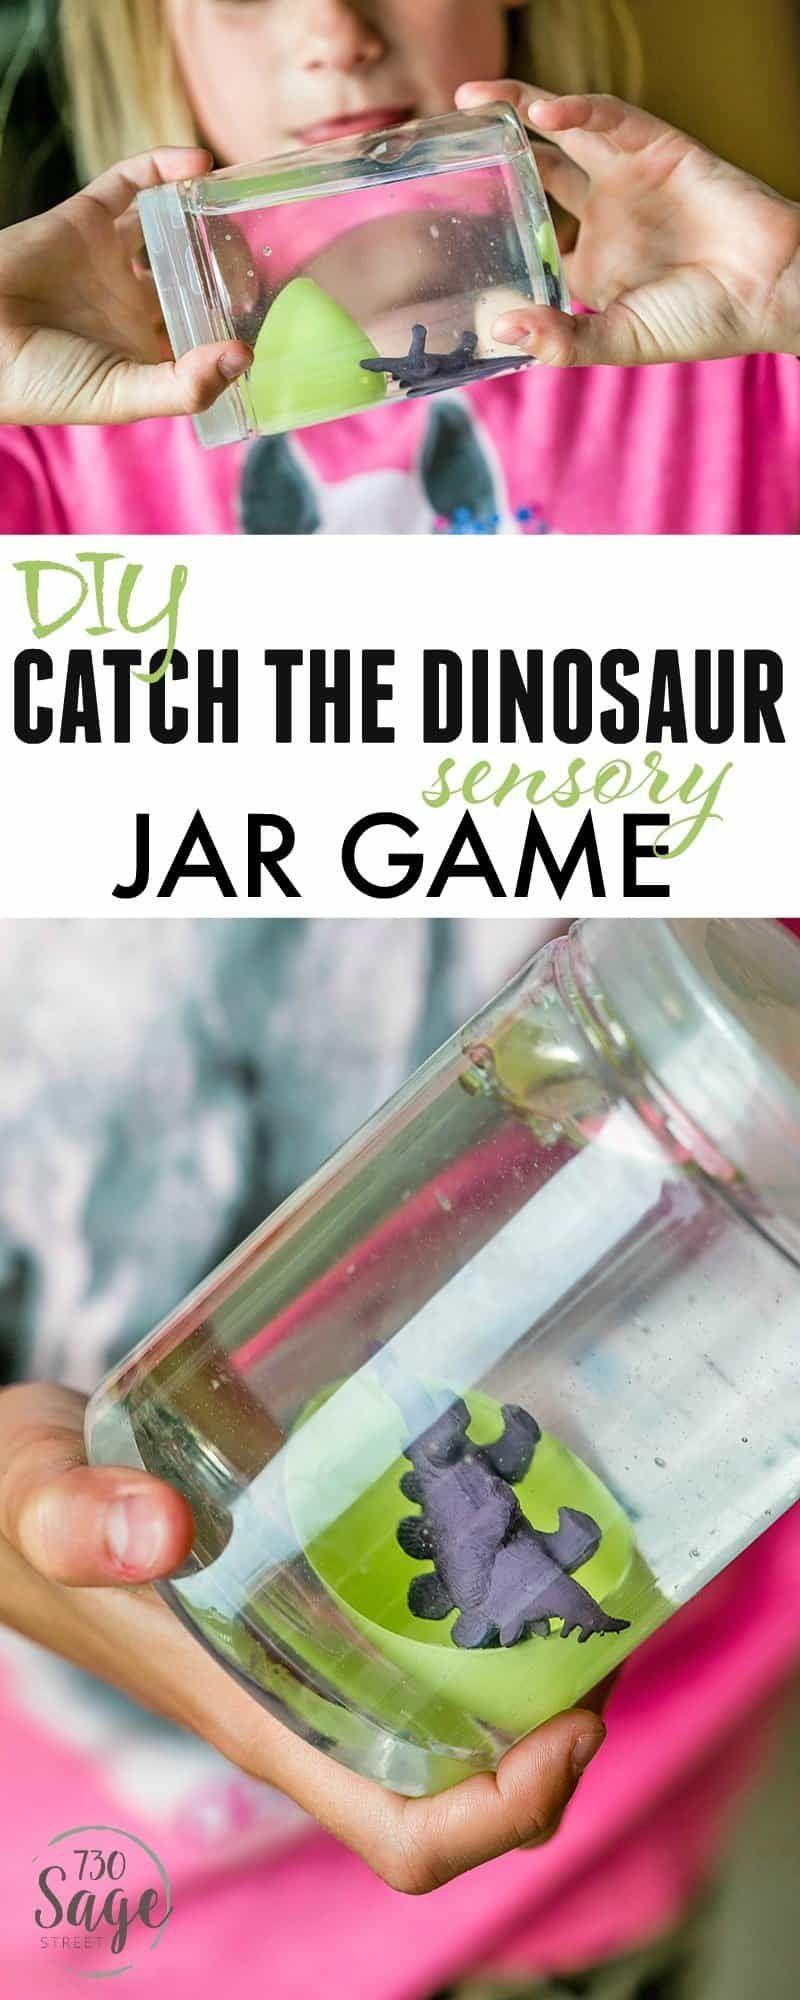 Dinosaur Preschool Crafts – DIY Catch The Dinosaur Sensory Jar Game #dinosaur